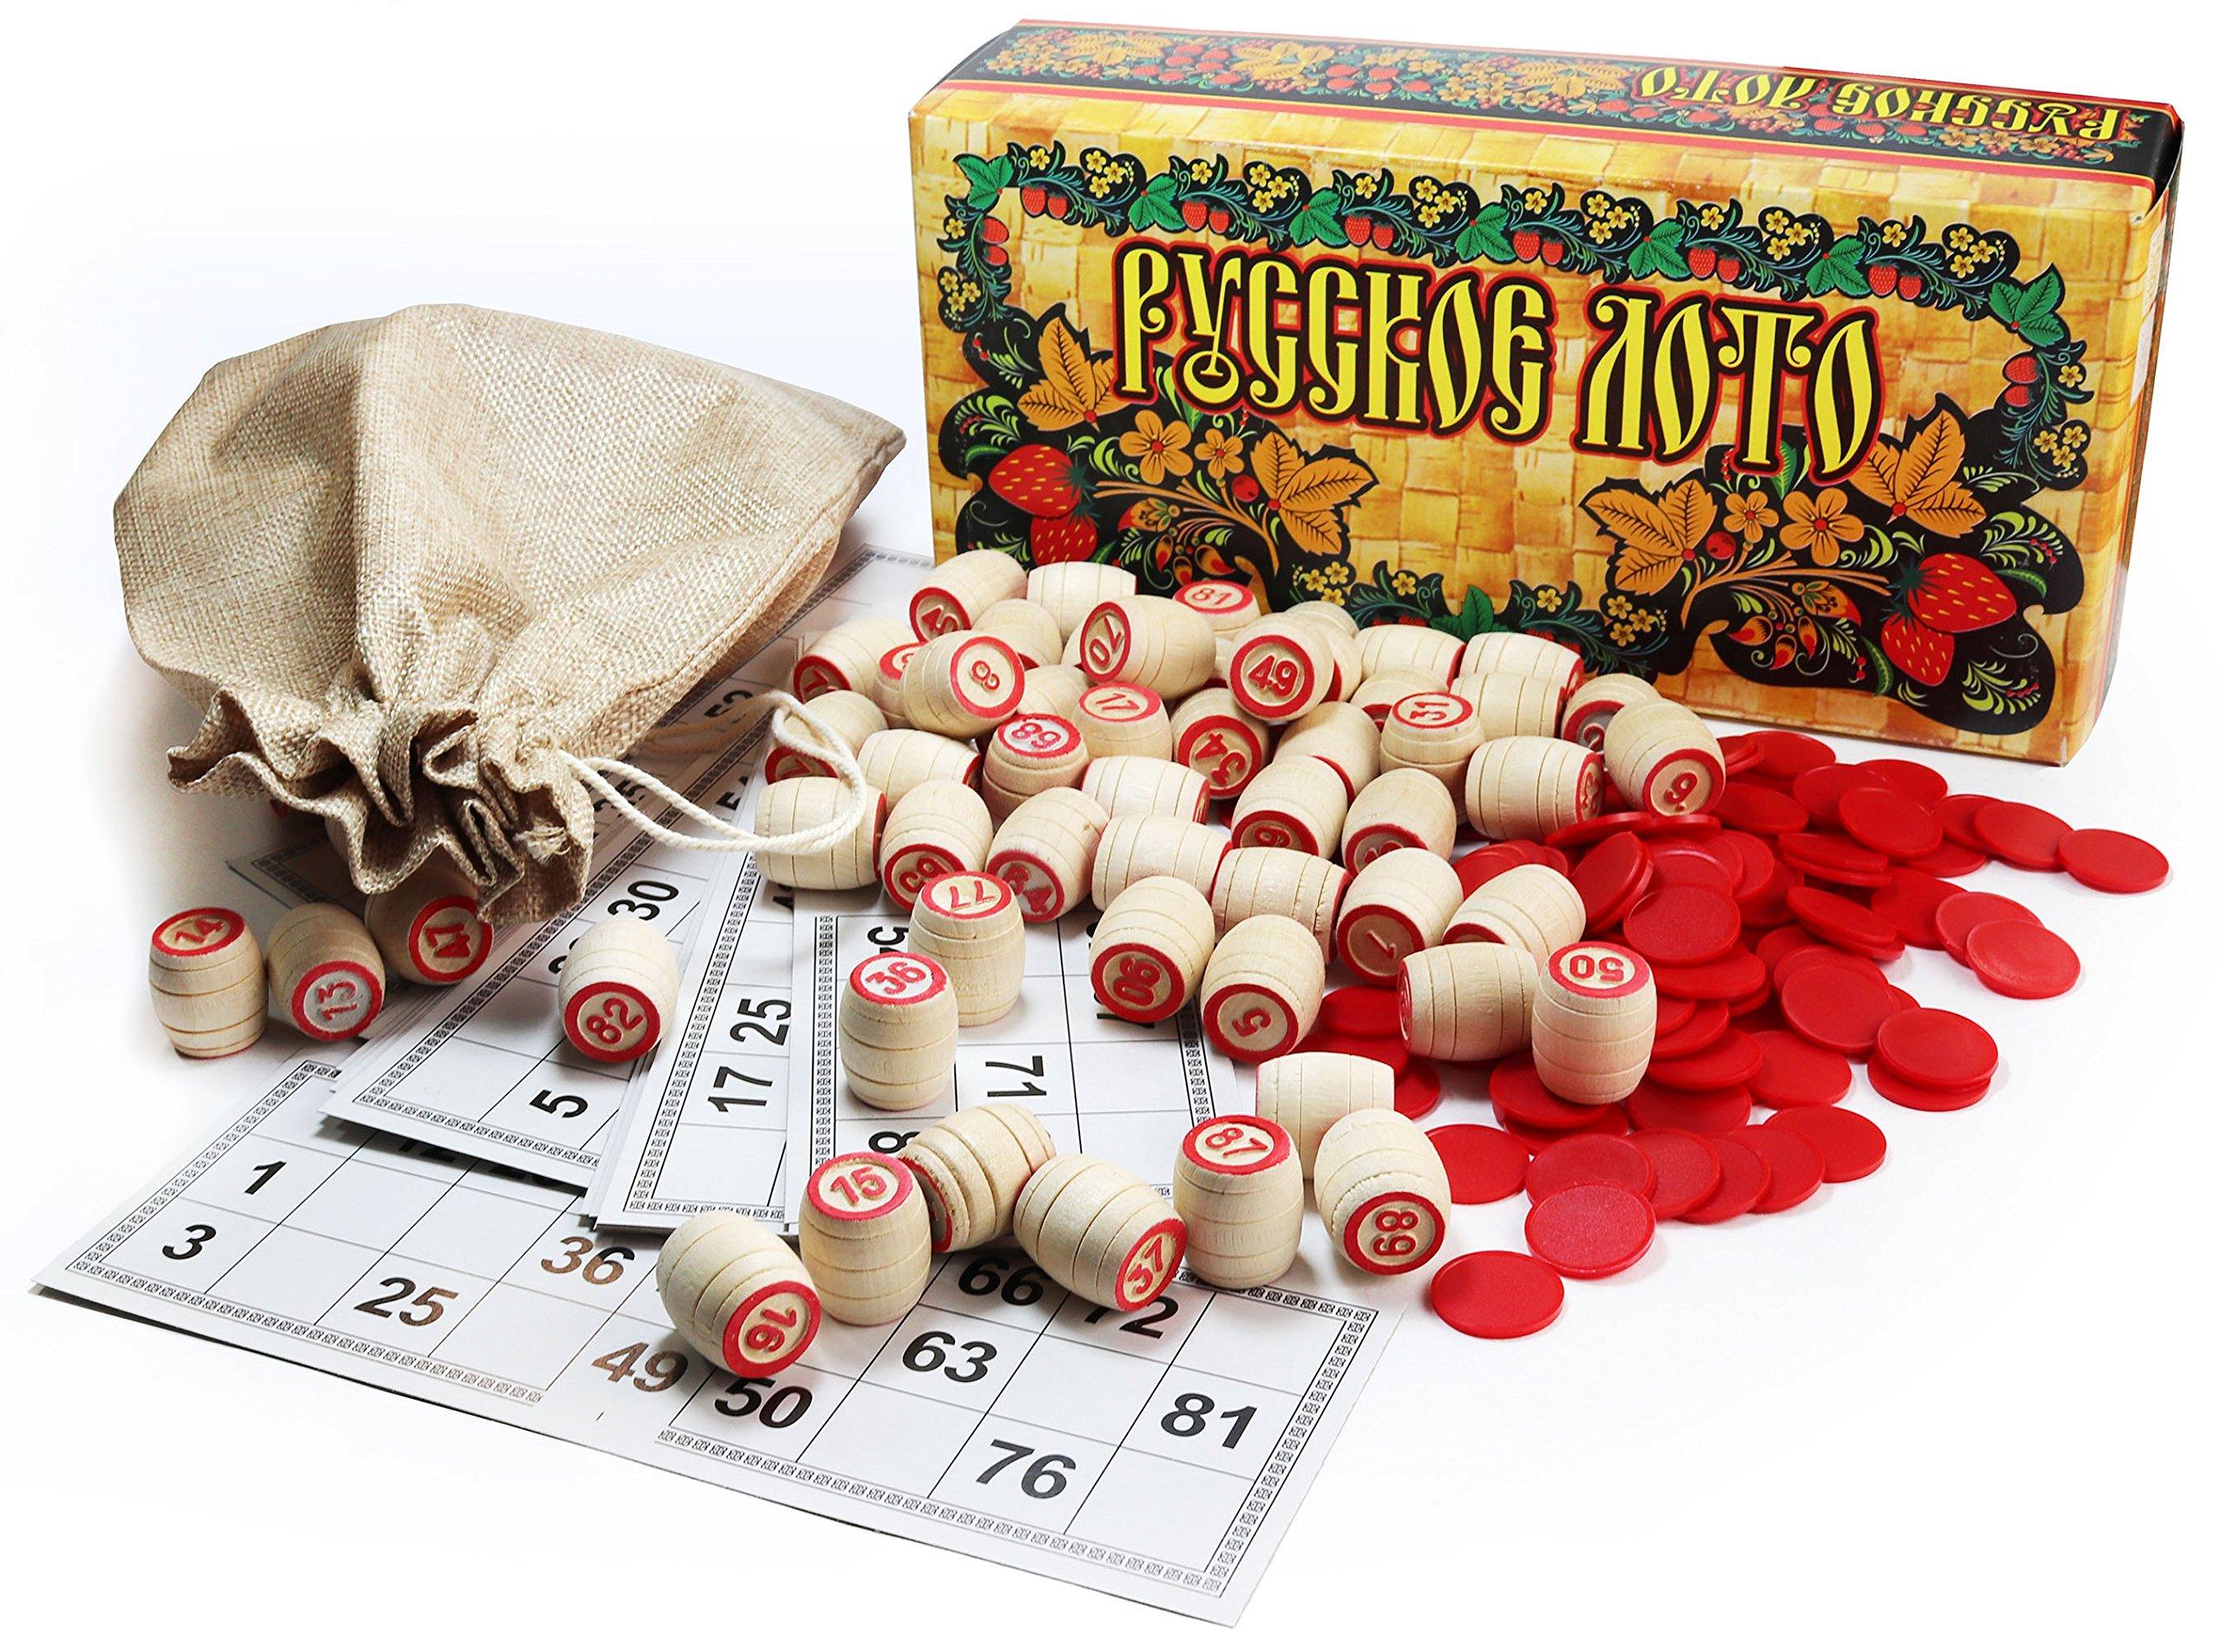 Russian Bingo Game - Russkoe Lotto with Wooden Barrels, Jute Sack, plastic Counters